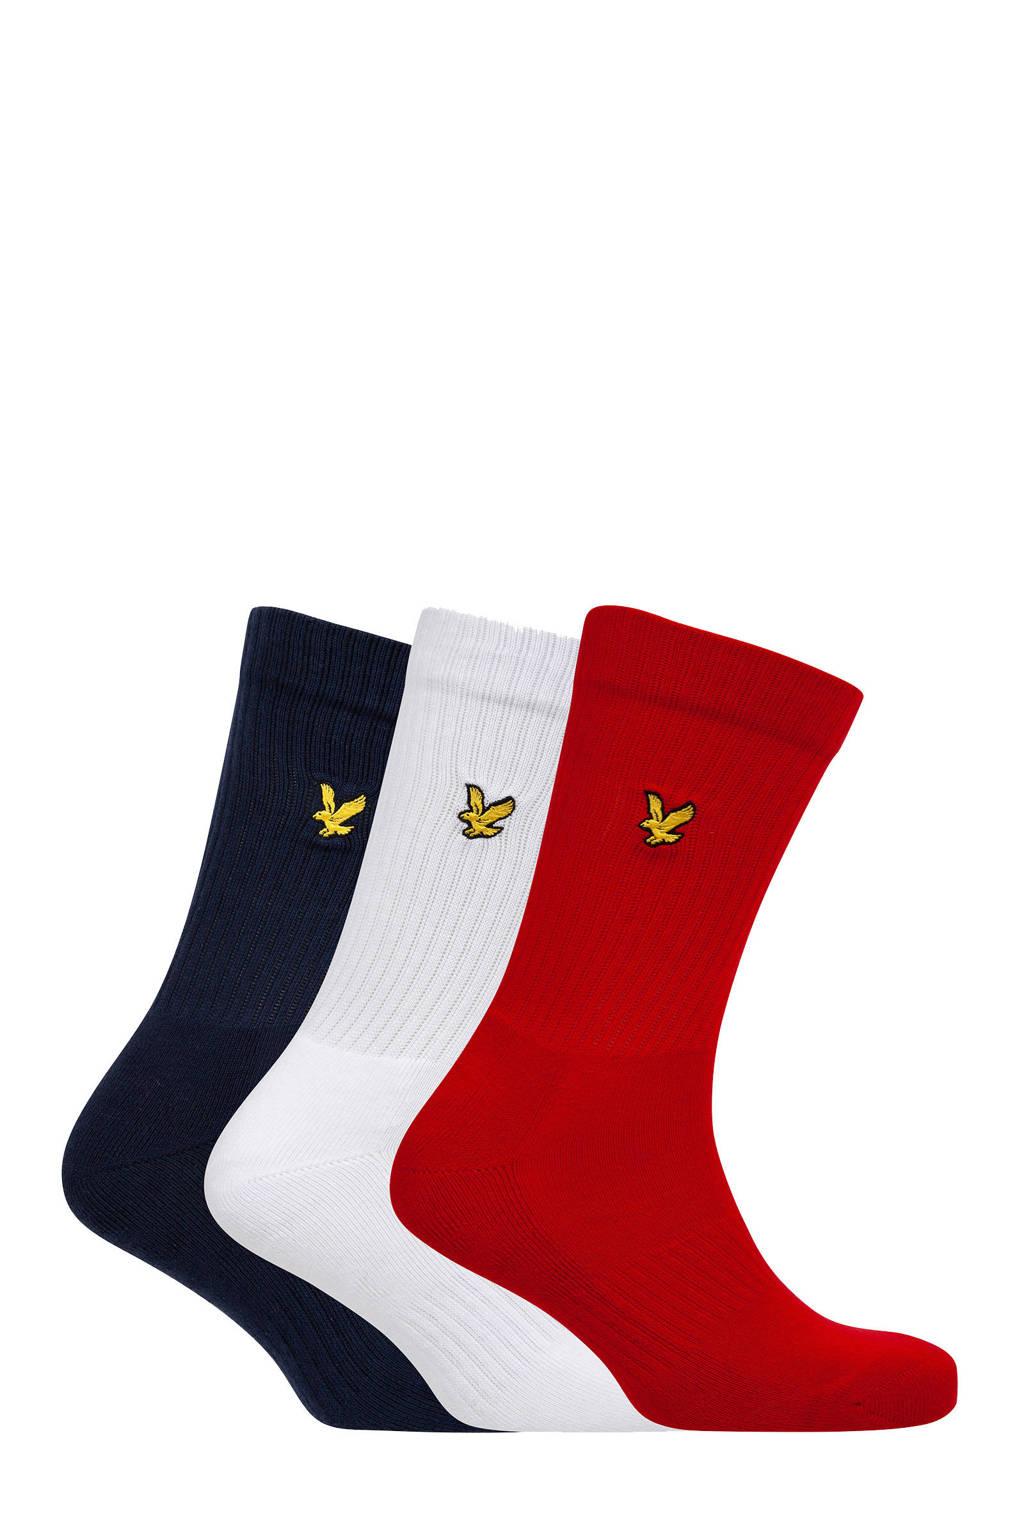 Lyle & Scott sokken Hamilton - set van 3 donkerblauw/wit/rood, Donkerblauw/wit/rood